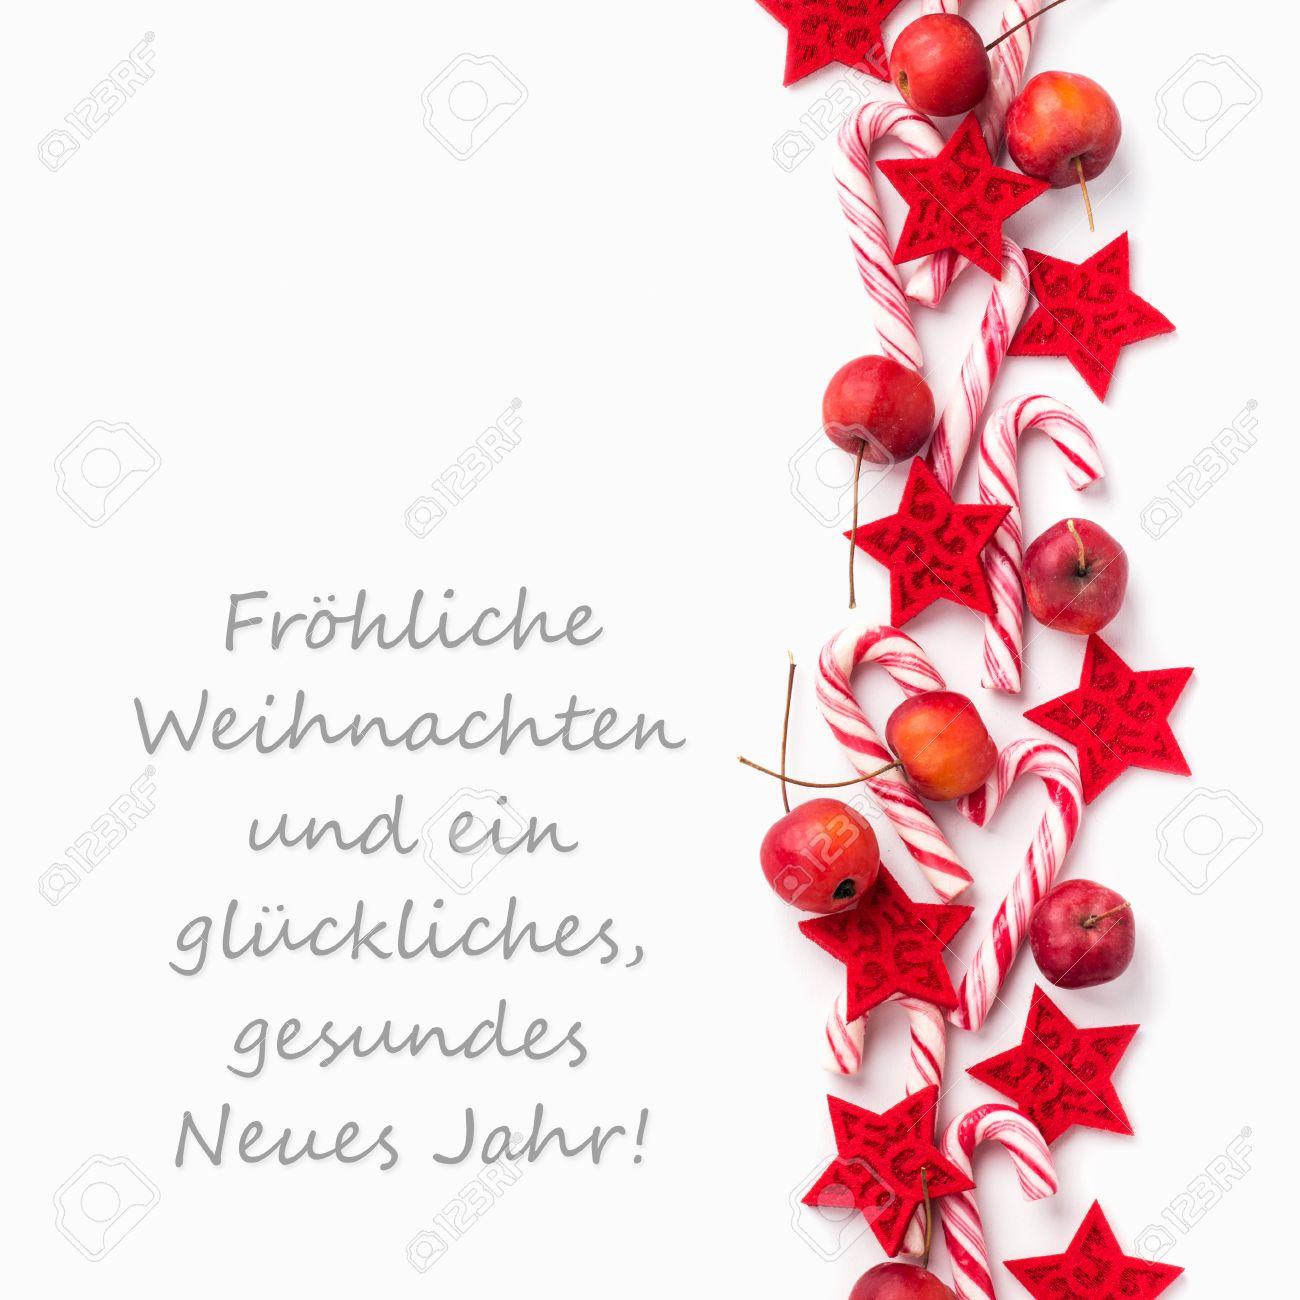 Frohe Weihnachten Text.Stock Photo